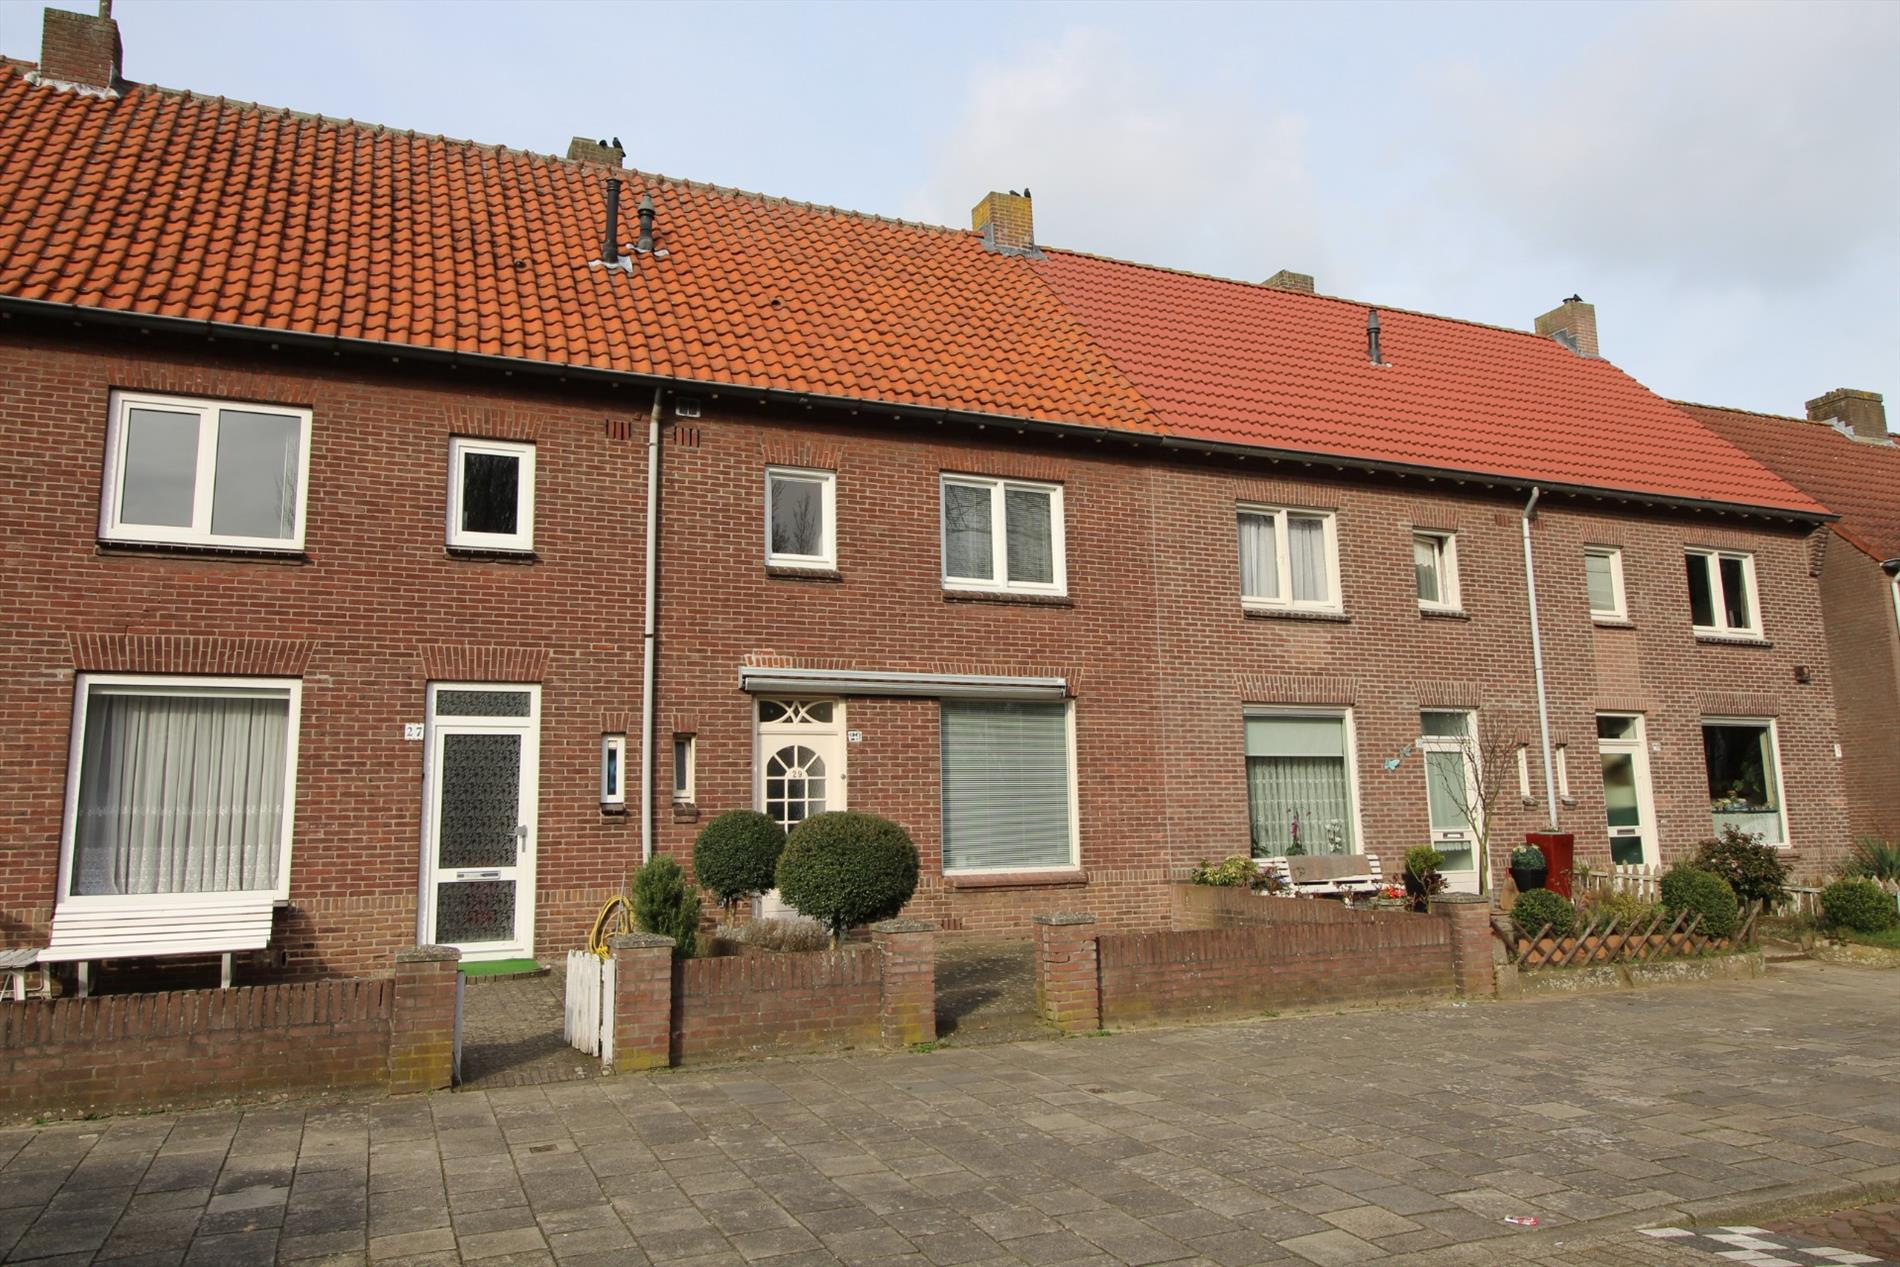 Viottastraat, Eindhoven